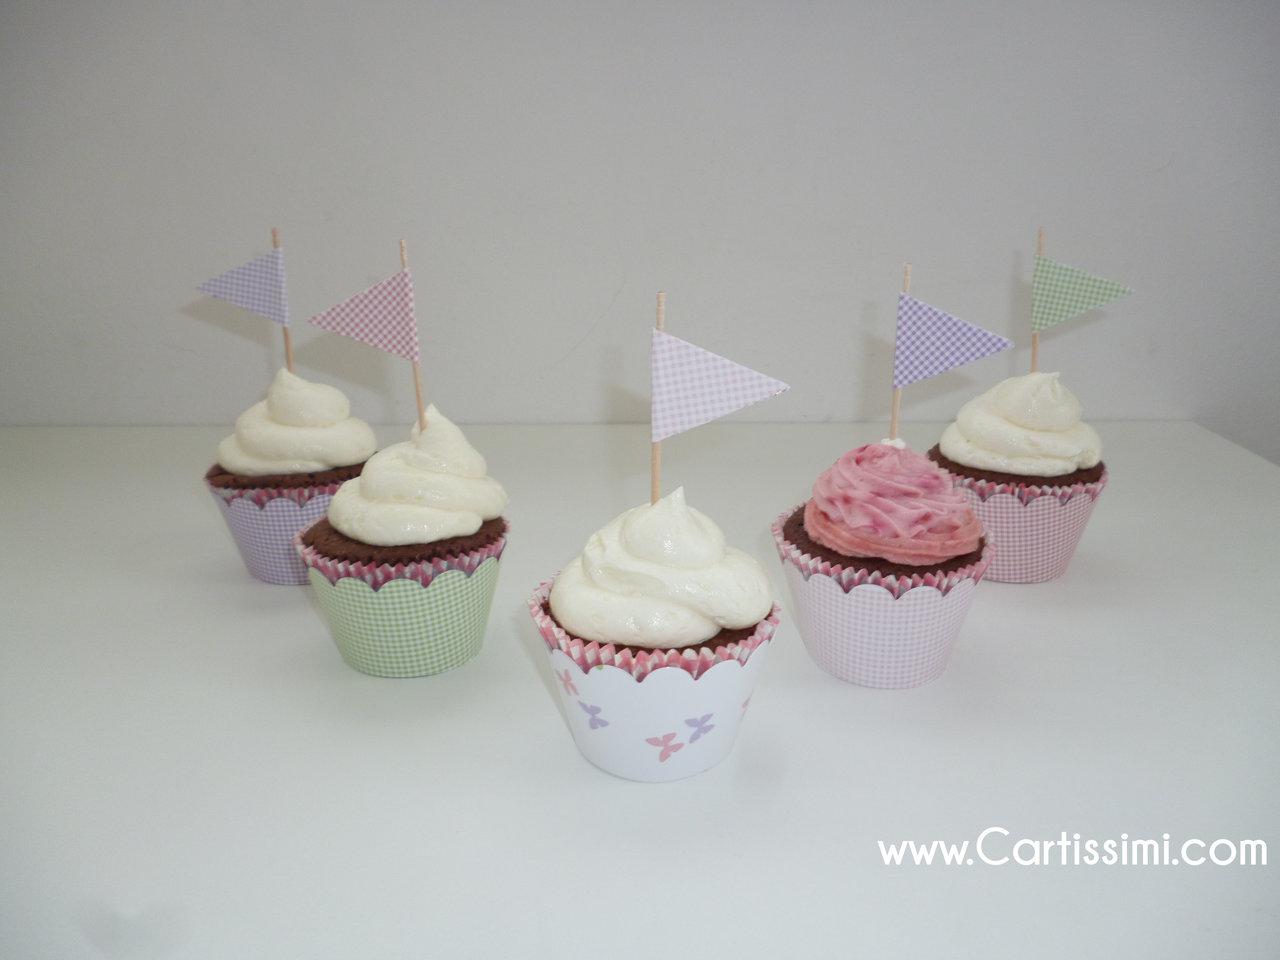 10 MuffinDekoFhnchen Becky Butterfly  wwwCartissimicom